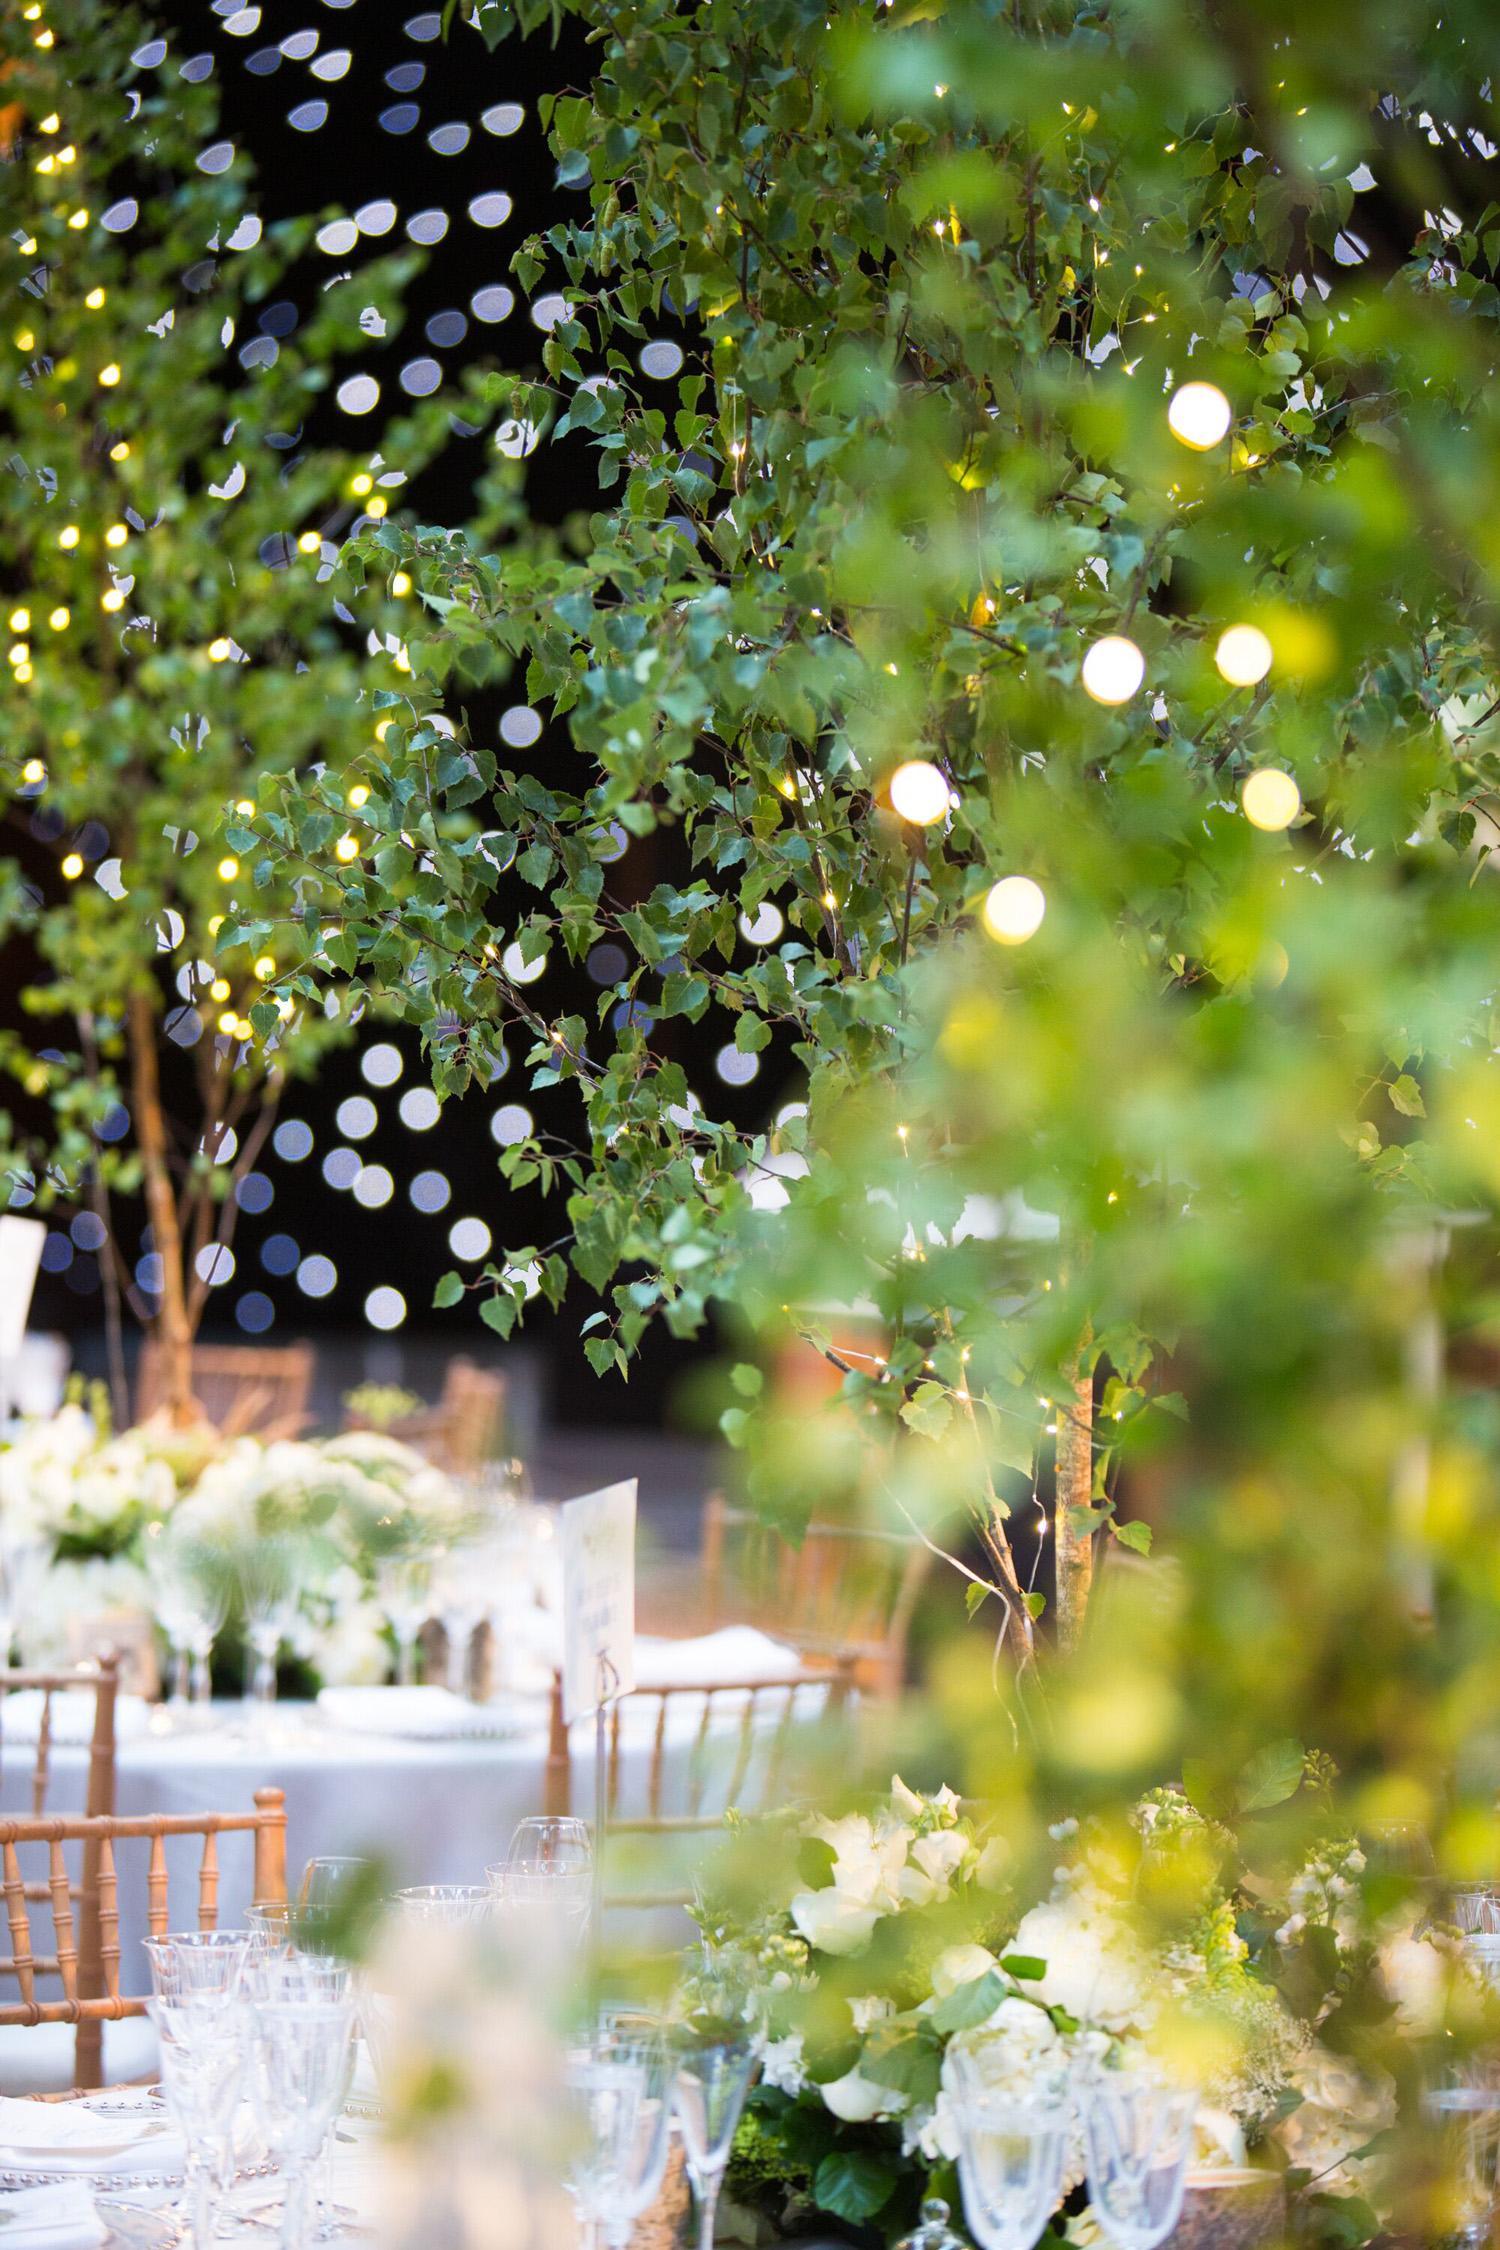 Littleton-Rose-Natural-History-Museum-London-Wedding-Planners-Trees.jpg